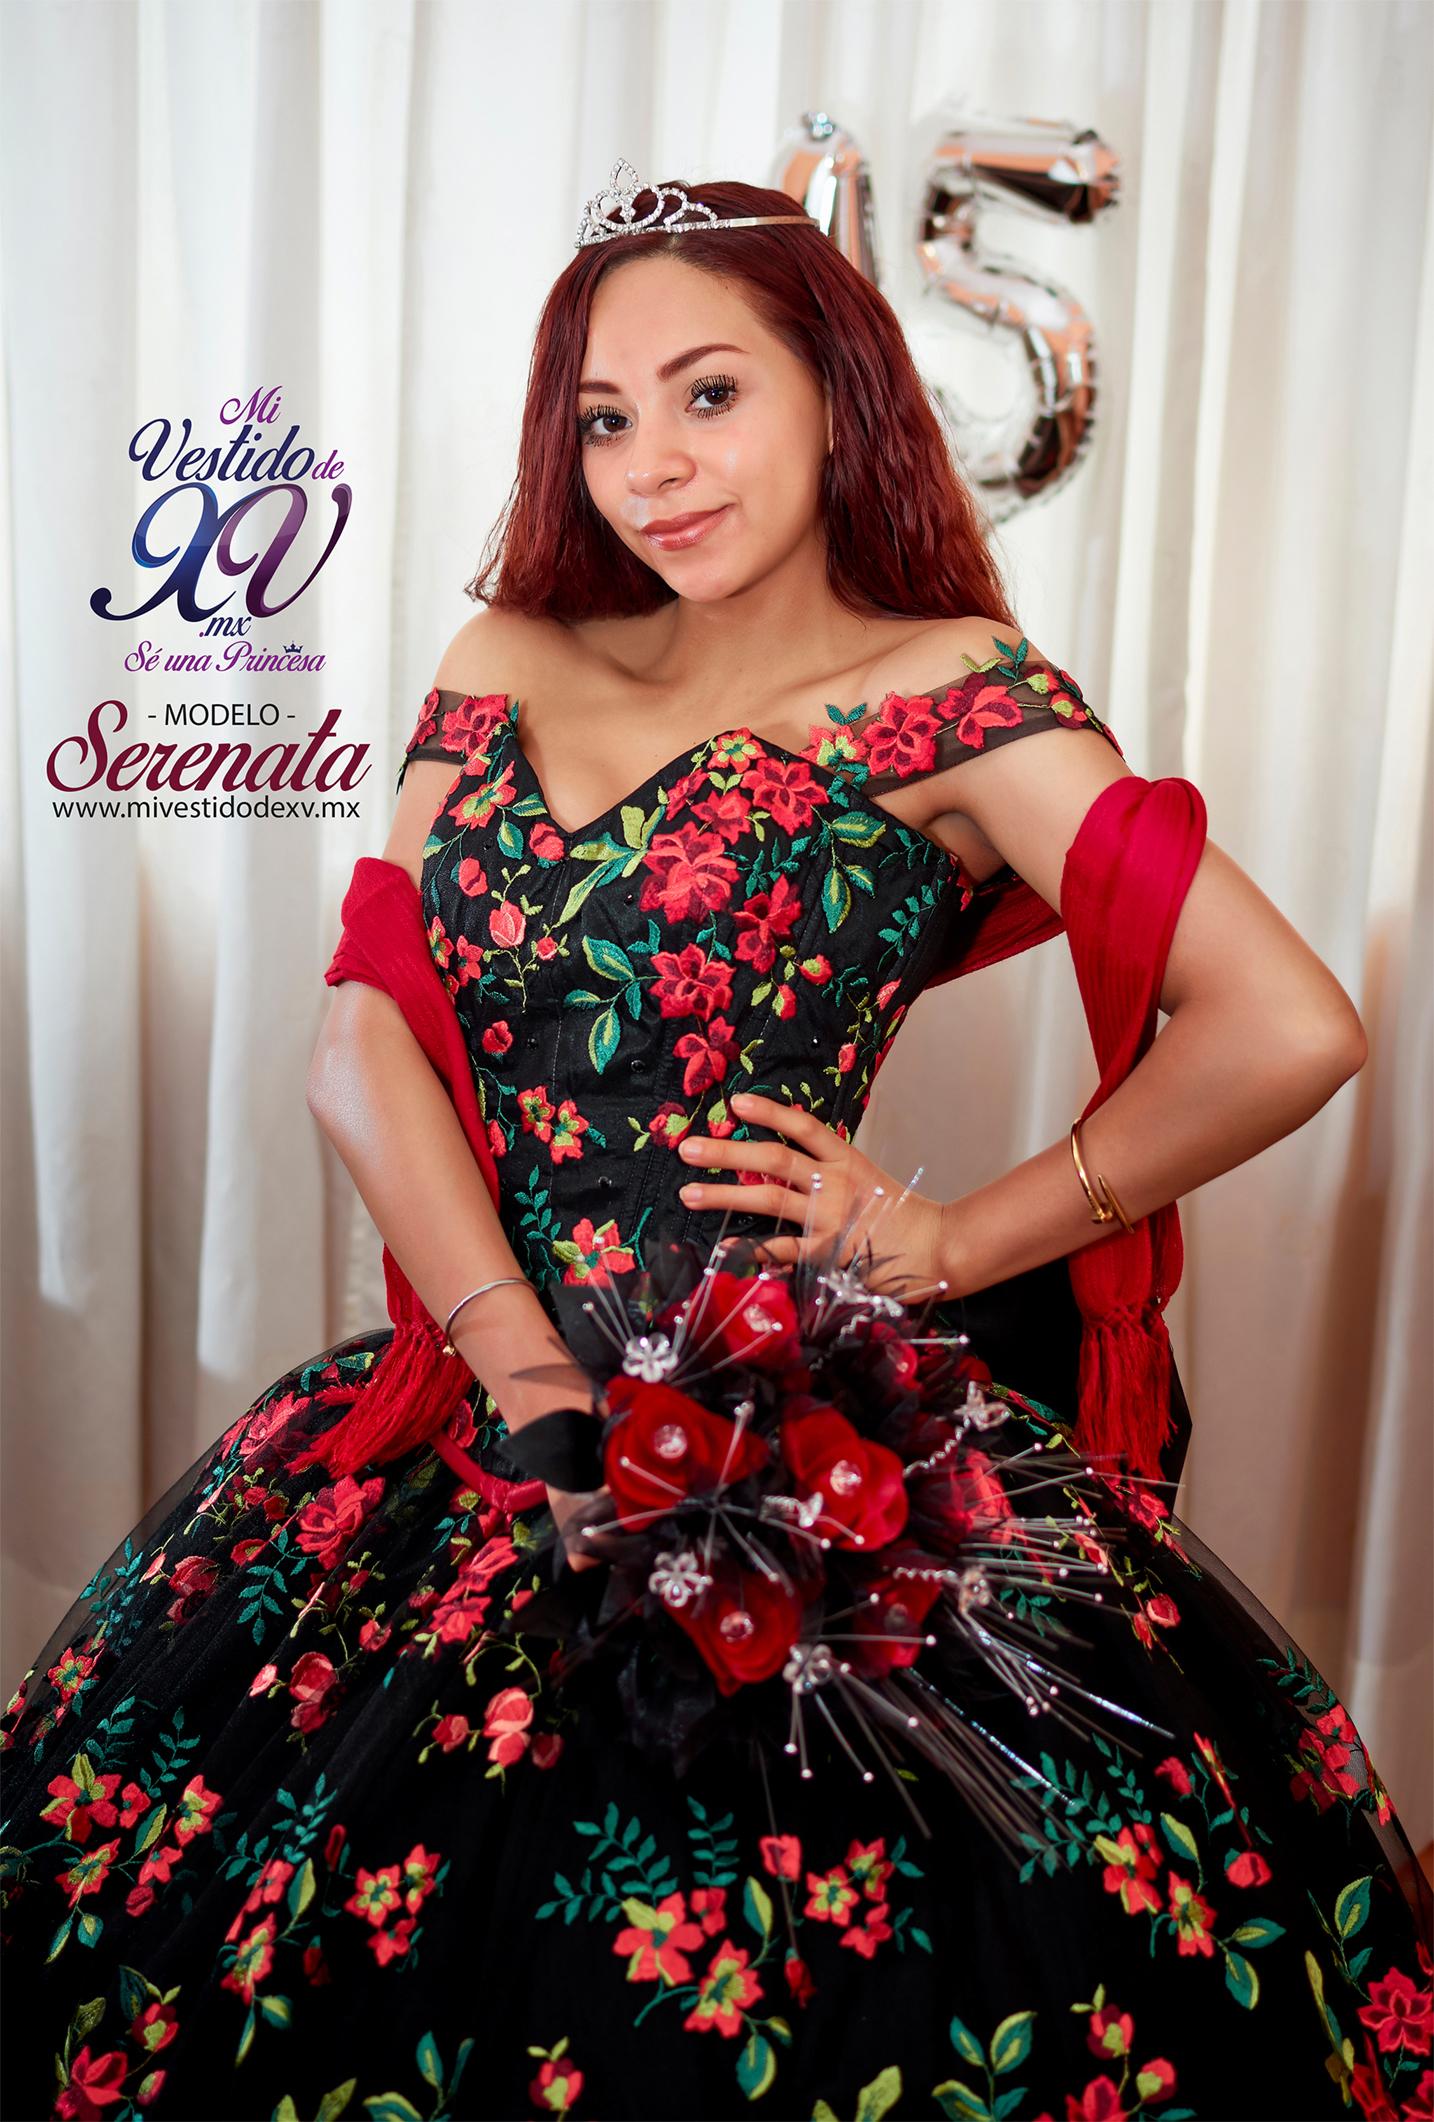 32e3ad99a34 Vestido De Xv Mexicano Tipsnet24com